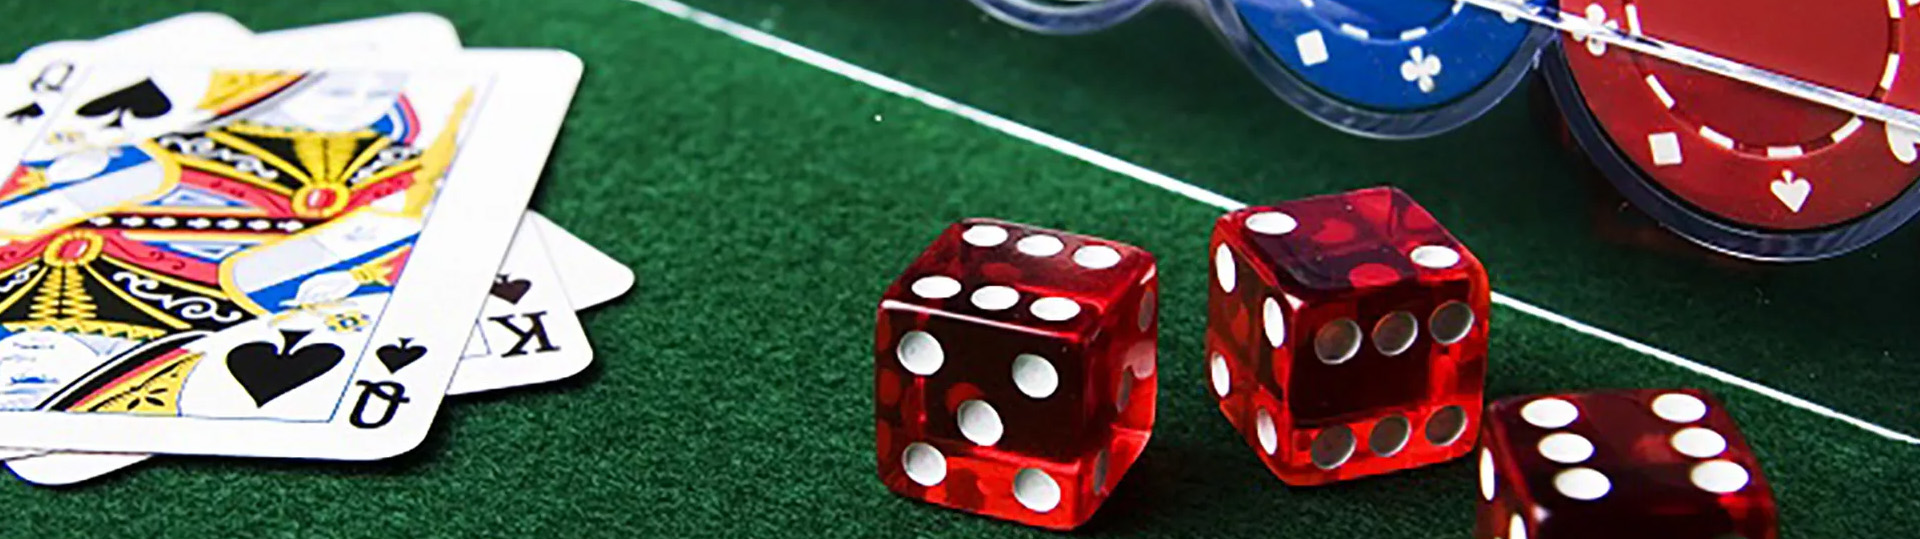 gambling at online casino